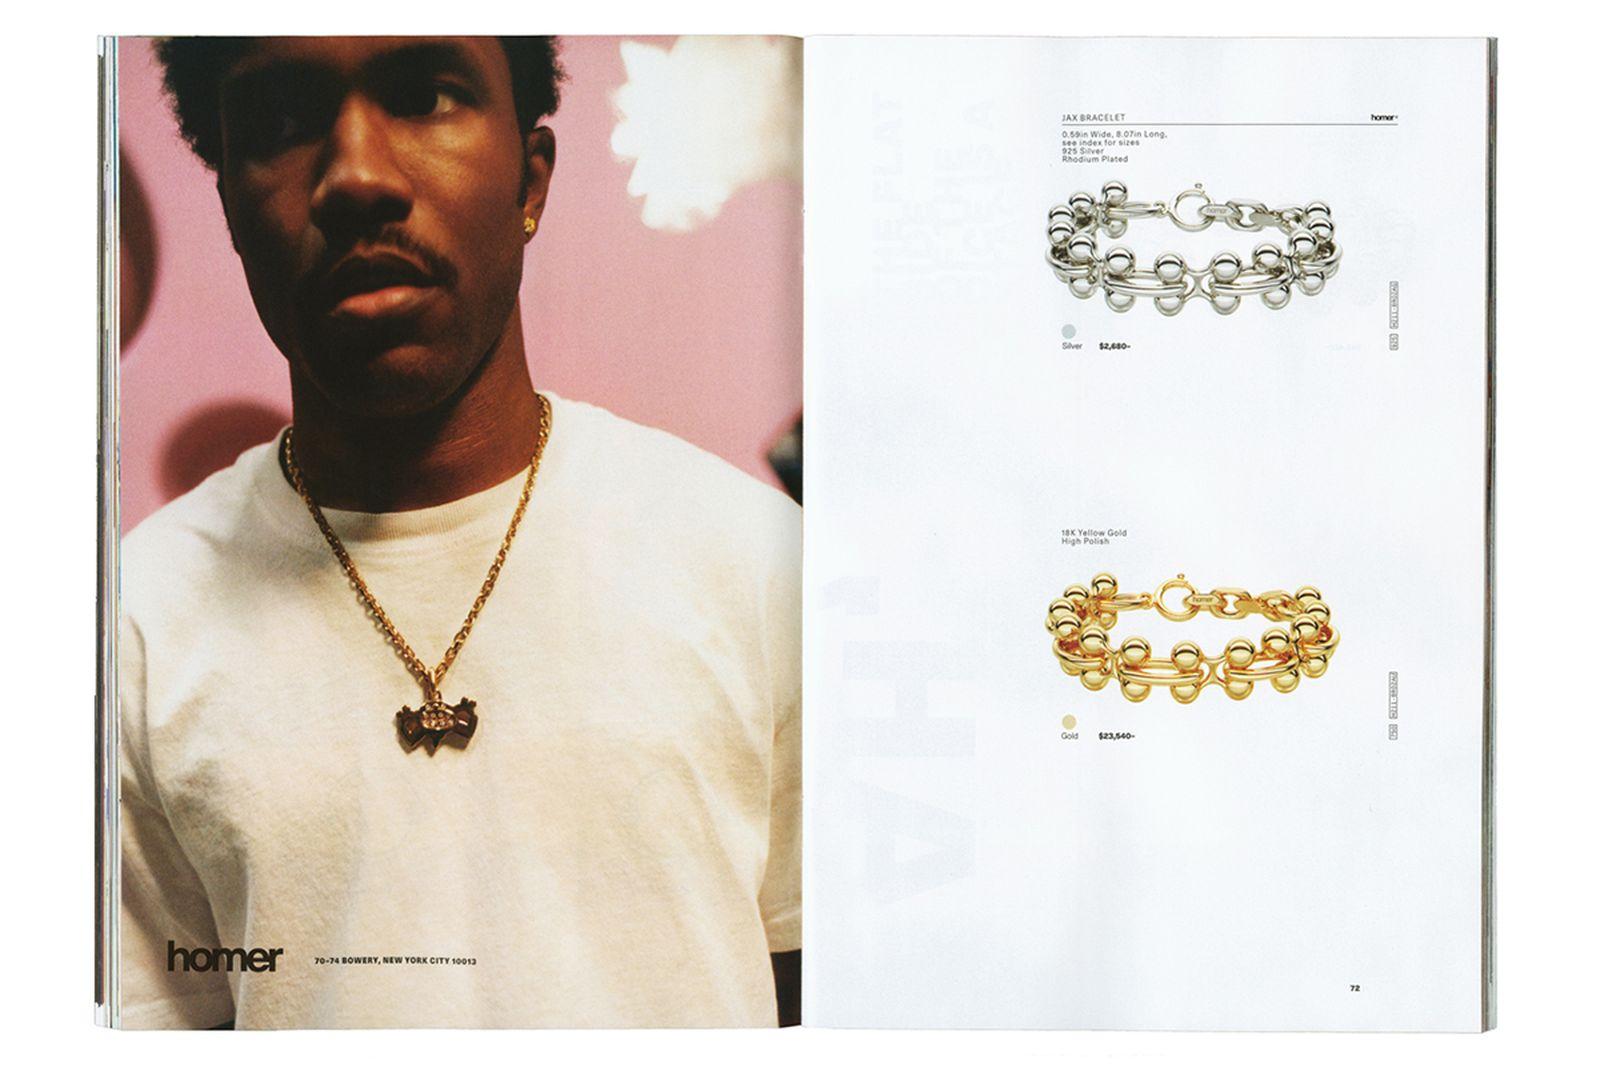 Frank Ocean Homer Brand store Catalog collection jewelry silk scarves bracelet